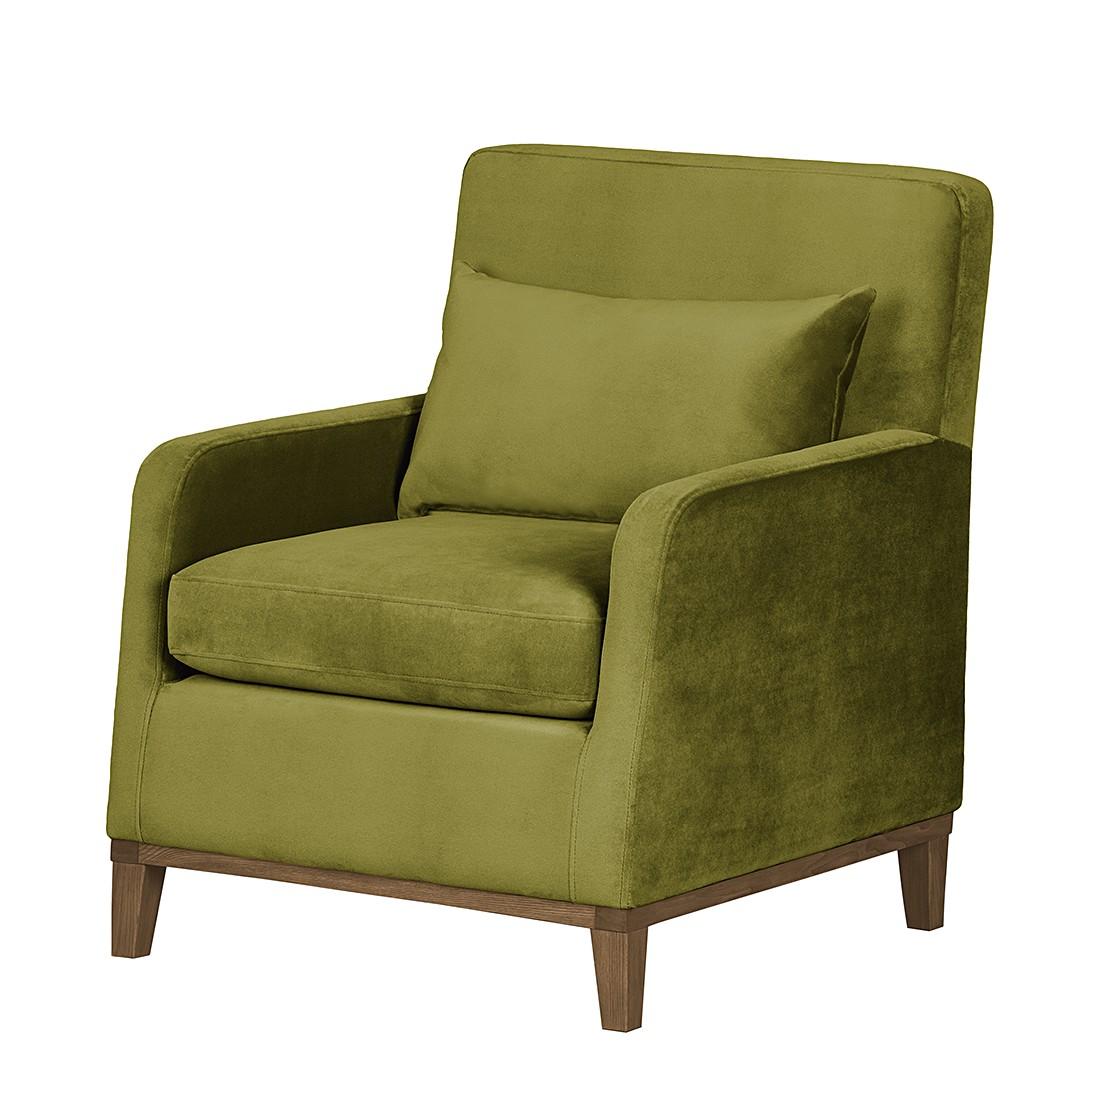 Sessel Blomma – Samtstoff Olivgrün – Gestell: Nussbaumfarbig, Mørteens online kaufen